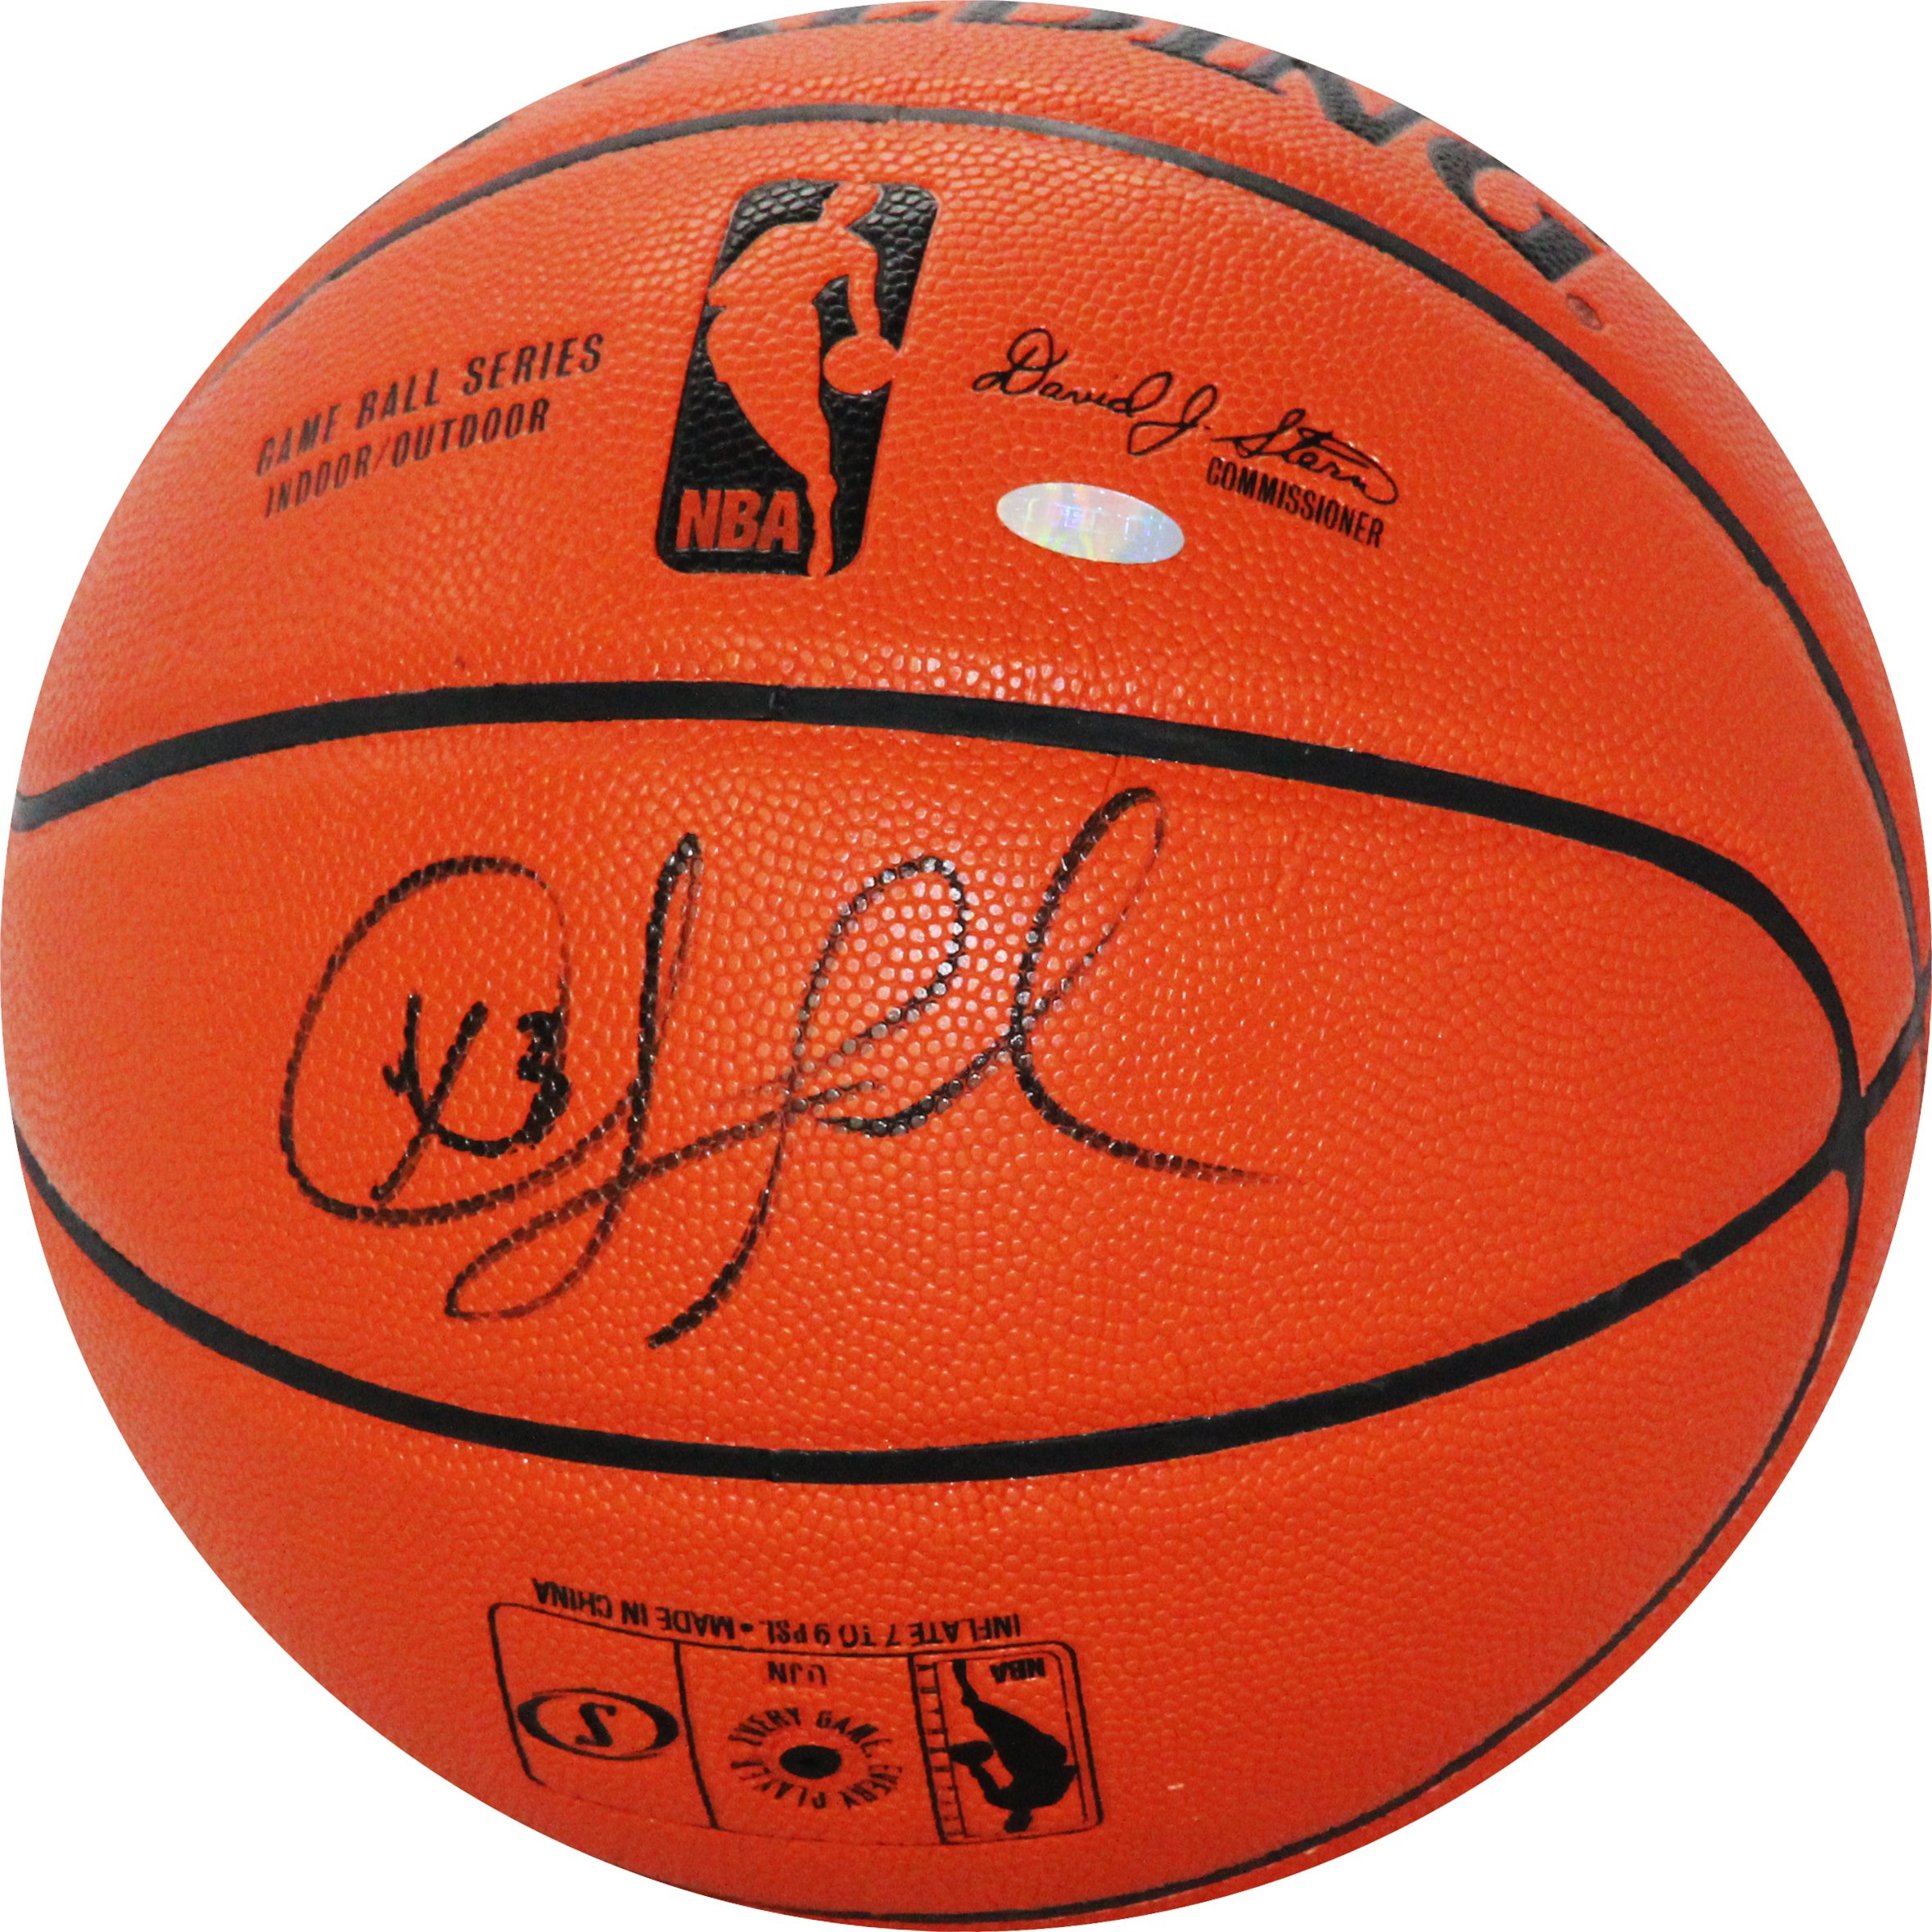 NBA Los Angeles Clippers Chris Paul Signed I/O Basketball